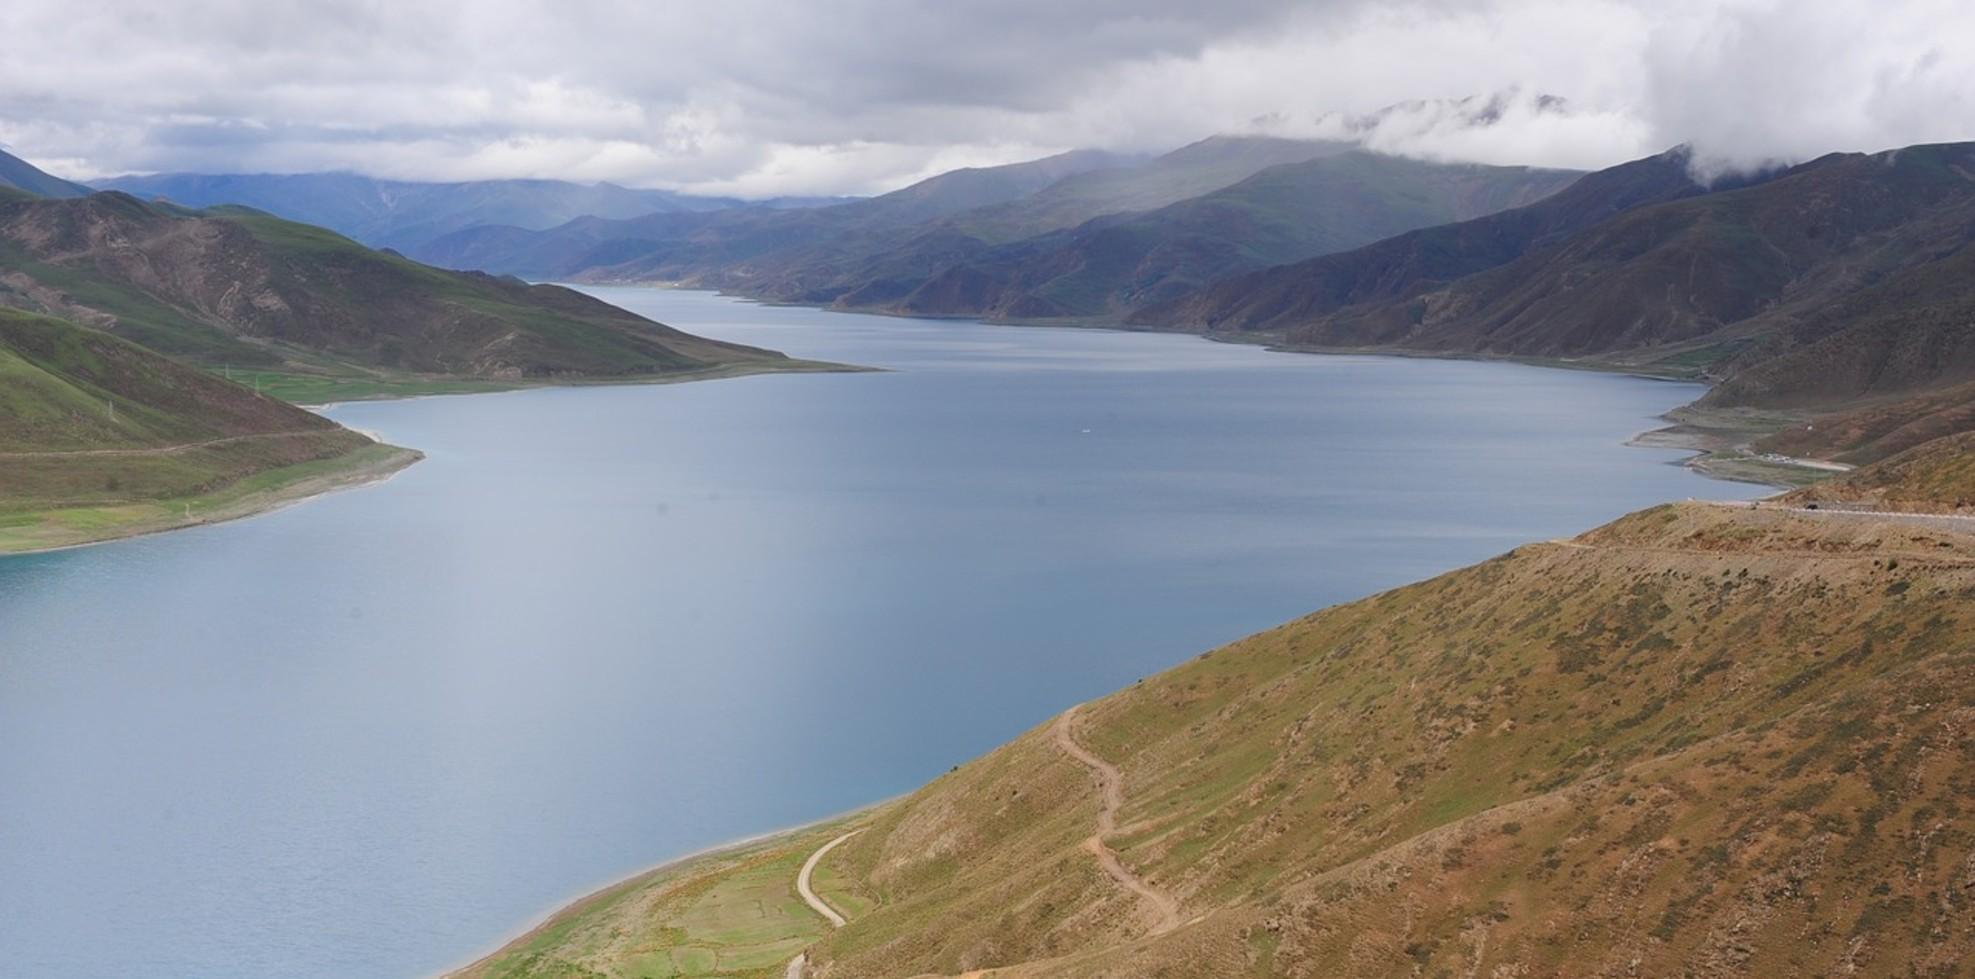 7Nights 8Days Kathmandu Lhasa Overland Tour